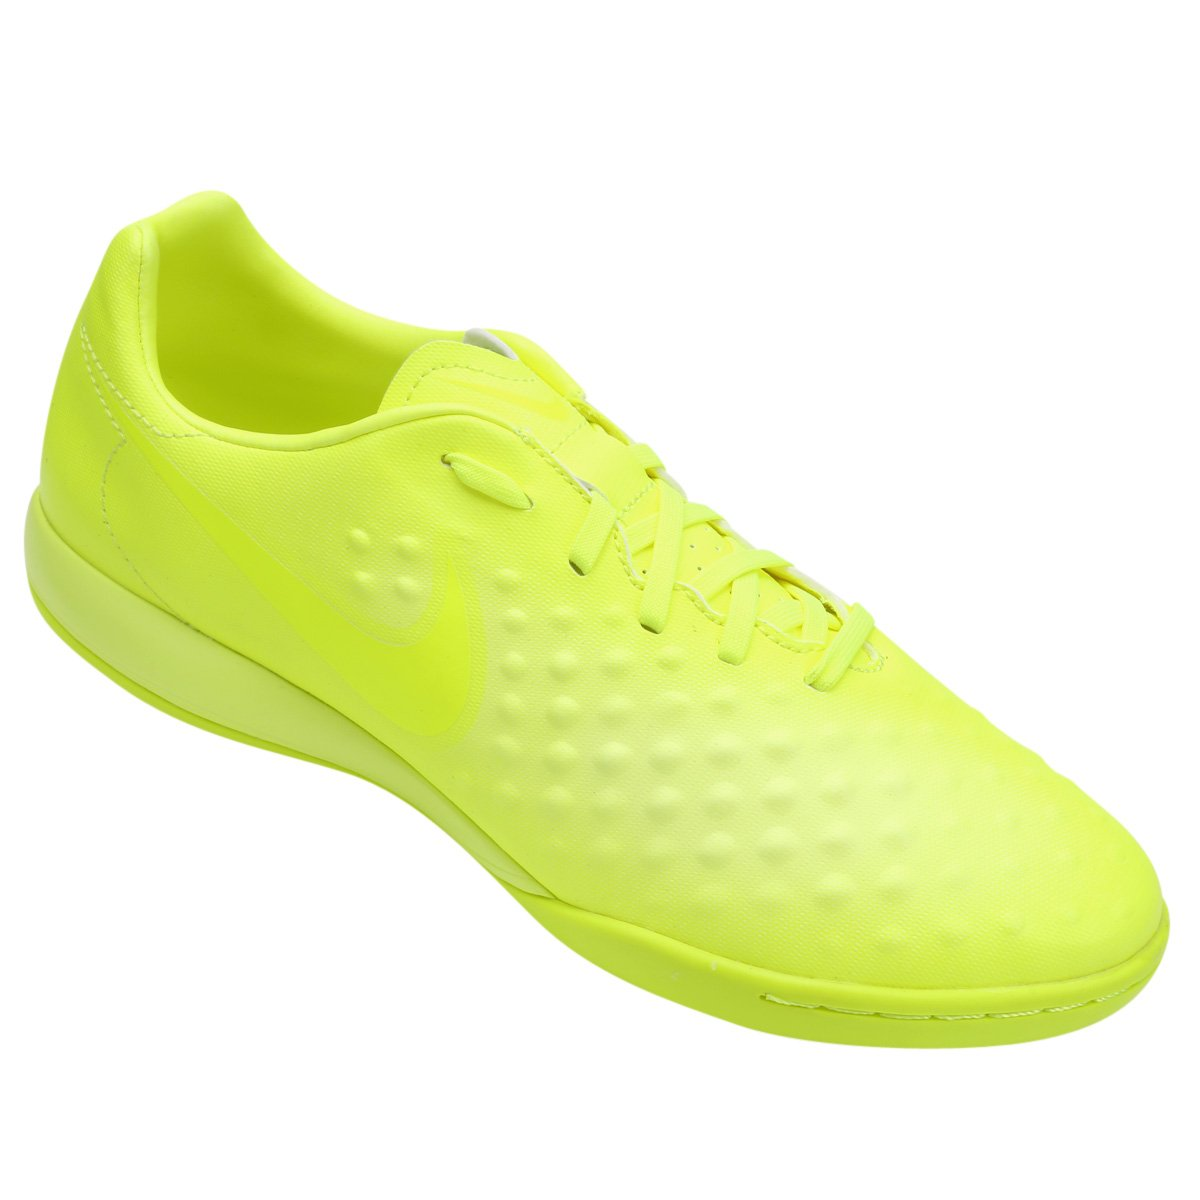 chuteira nike magista onda ic 651541  chuteira futsal nike magista onda ii  ic masculina verde limo 1f7ac3a768c31